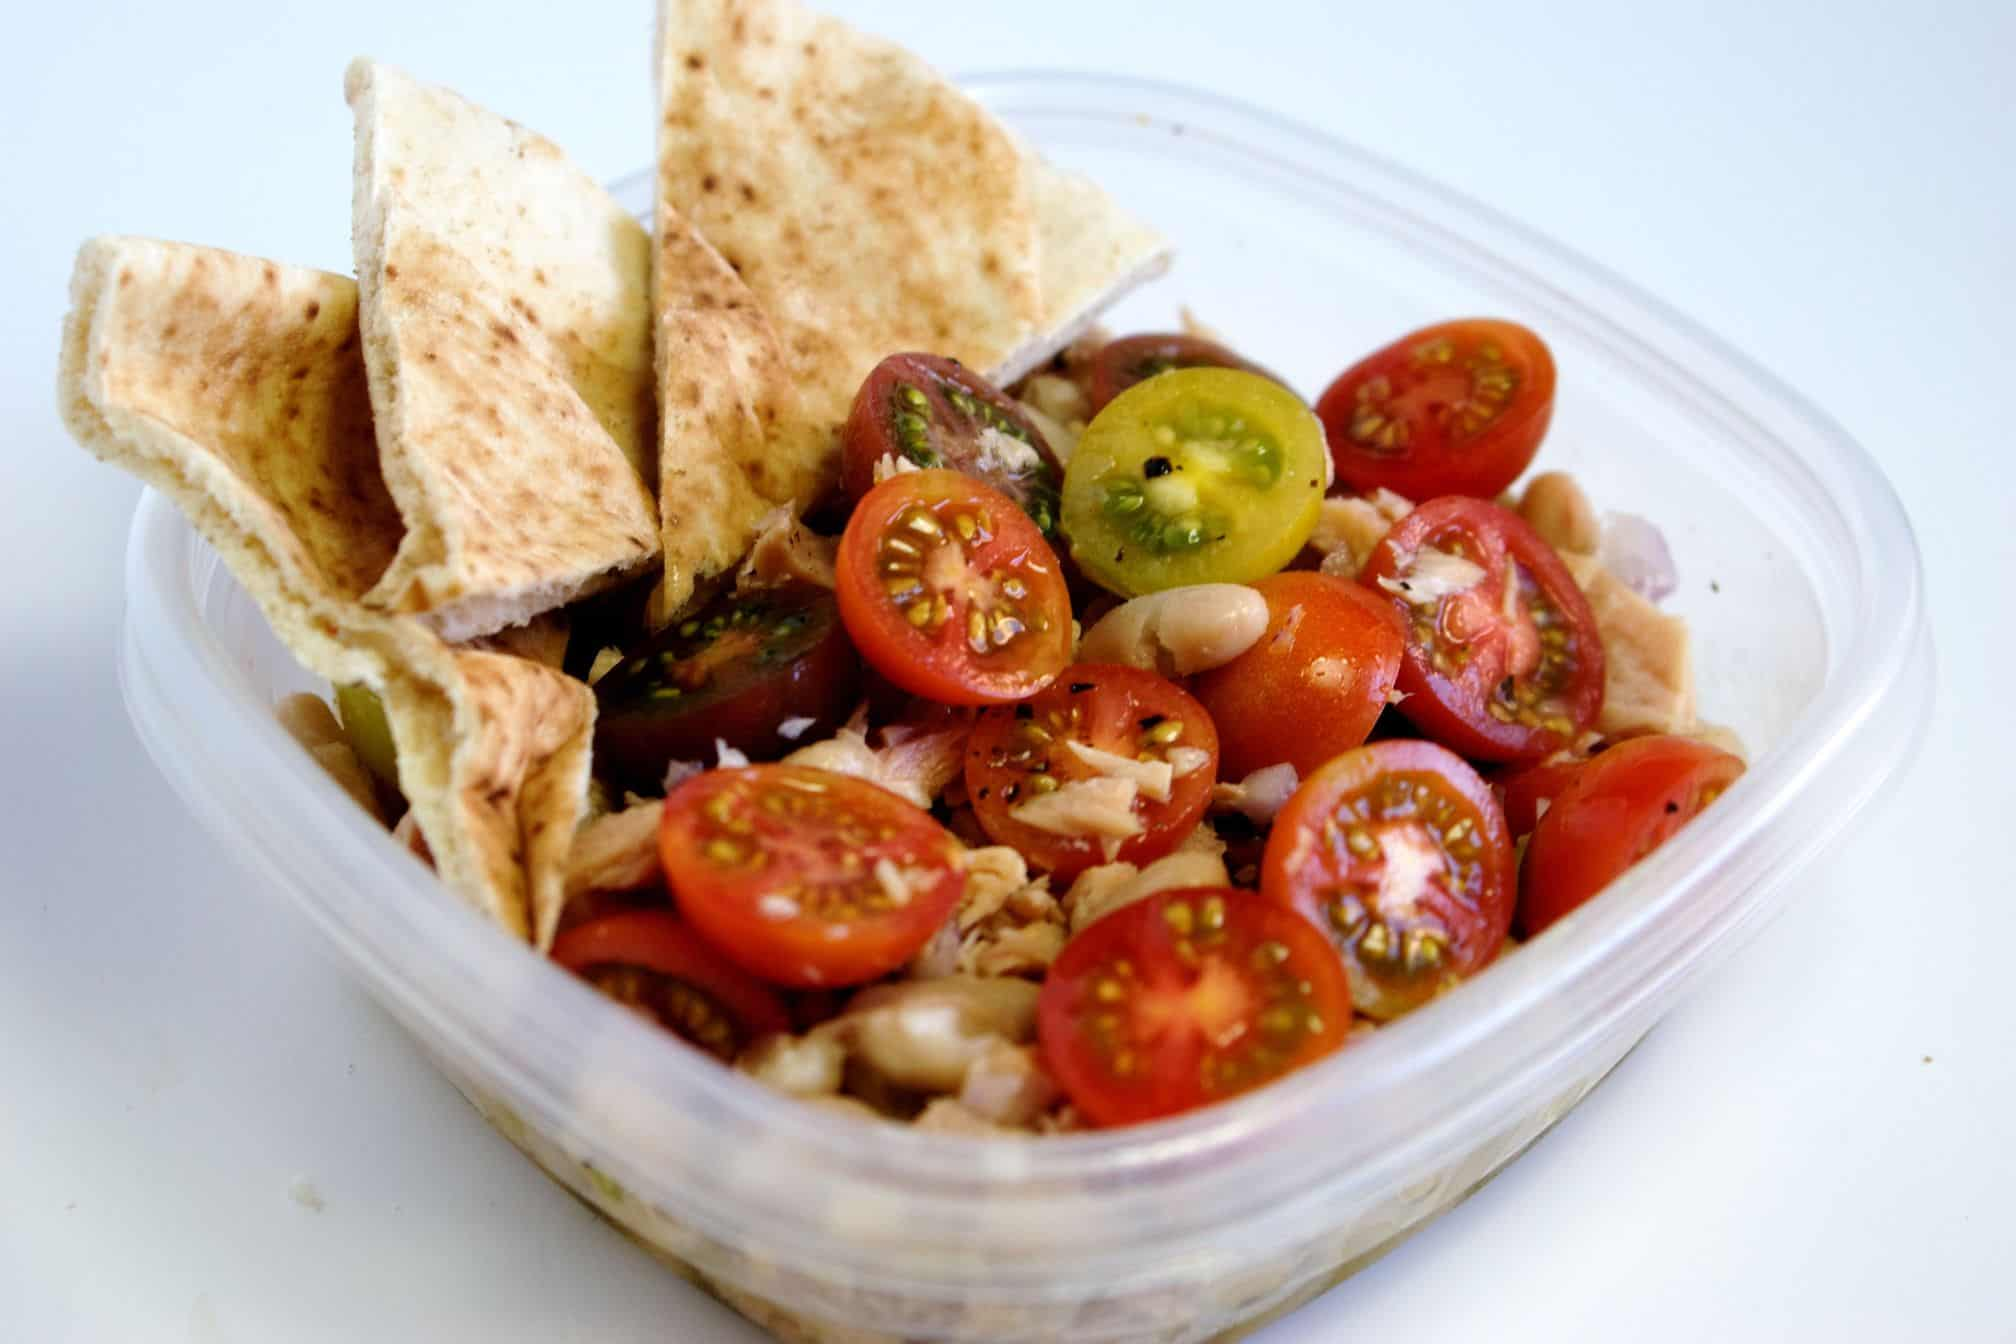 "Tuna and white bean salad with tomatoes ""width ="" 2016 ""height ="" 1344 ""srcset ="" https://cdn.diys.com/wp-content/uploads/2020/06/Tuna-and-white-bean-salad -with-tomatoes.jpg 2016w, https://cdn.diys.com/wp-content/uploads/2020/06/Tuna-and-white-bean-salad-with-tomatoes-300x200.jpg 300w, https: / /cdn.diys.com/wp-content/uploads/2020/06/Tuna-and-white-bean-salad-with-tomatoes-1024x683.jpg 1024w, https://cdn.diys.com/wp-content/ uploads / 2020/06 / Tuna and white bean salad-with tomatoes-768x512.jpg 768w, https://cdn.diys.com/wp-content/uploads/2020/06/Tuna-and-white bean salad-with tomatoes -1536x1024.jpg 1536w ""dimensions ="" (maximum width: 2016 pixels) 100vw, 2016 pixels"